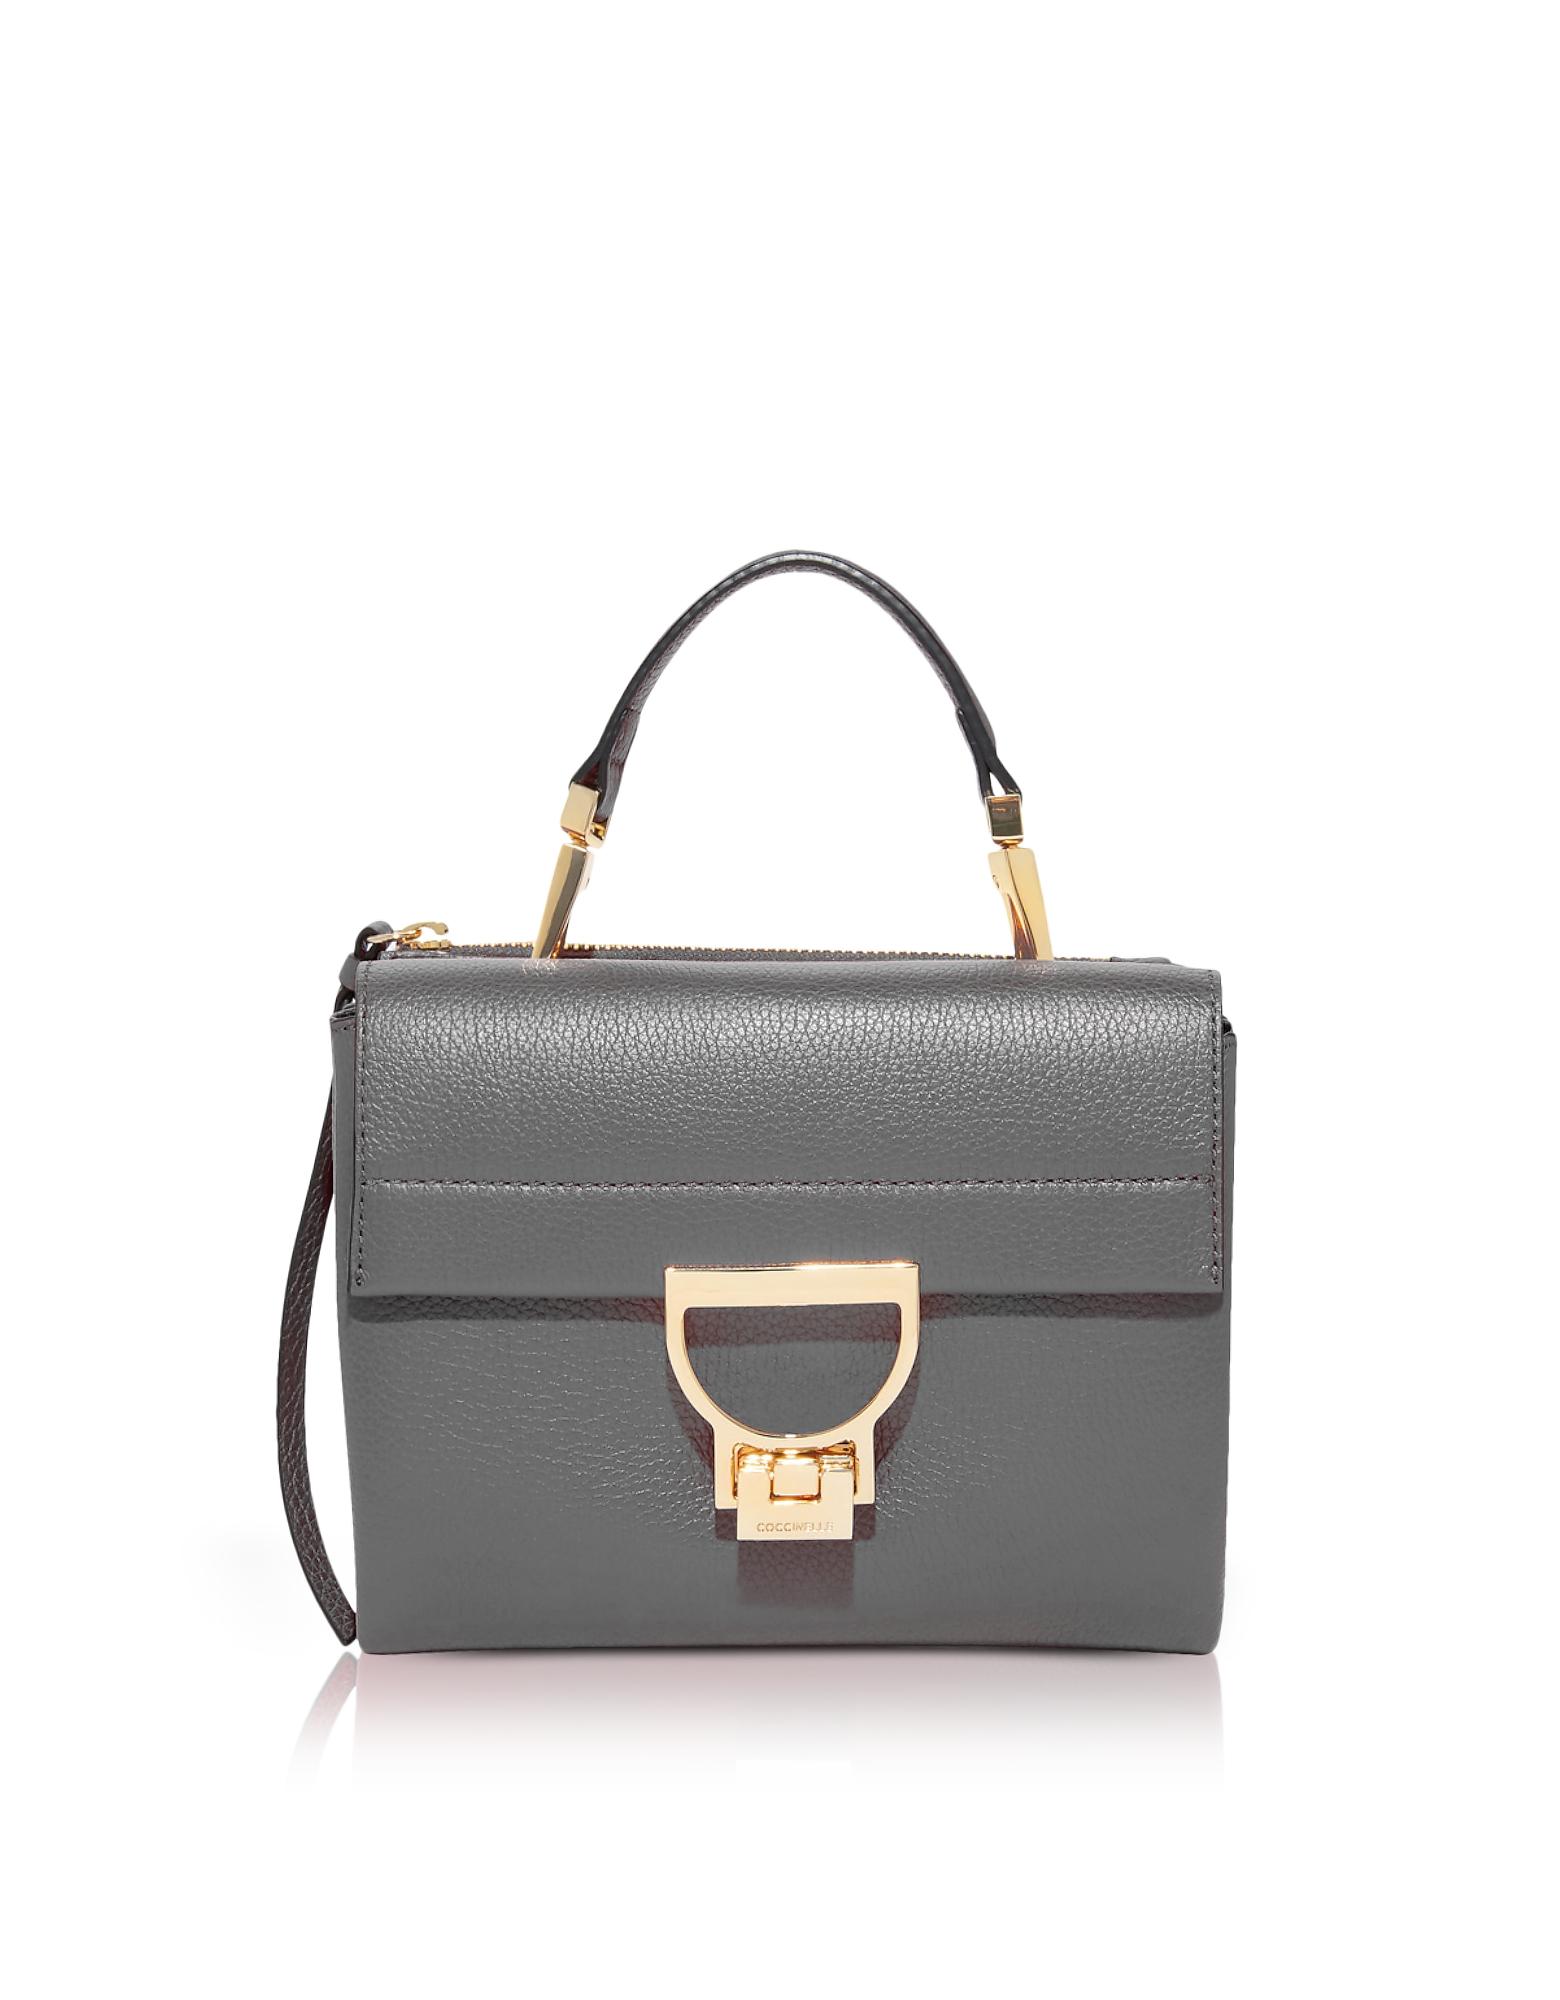 Coccinelle Handbags, Arlettis Grained Leather Mini Bag w/Shoulder Strap